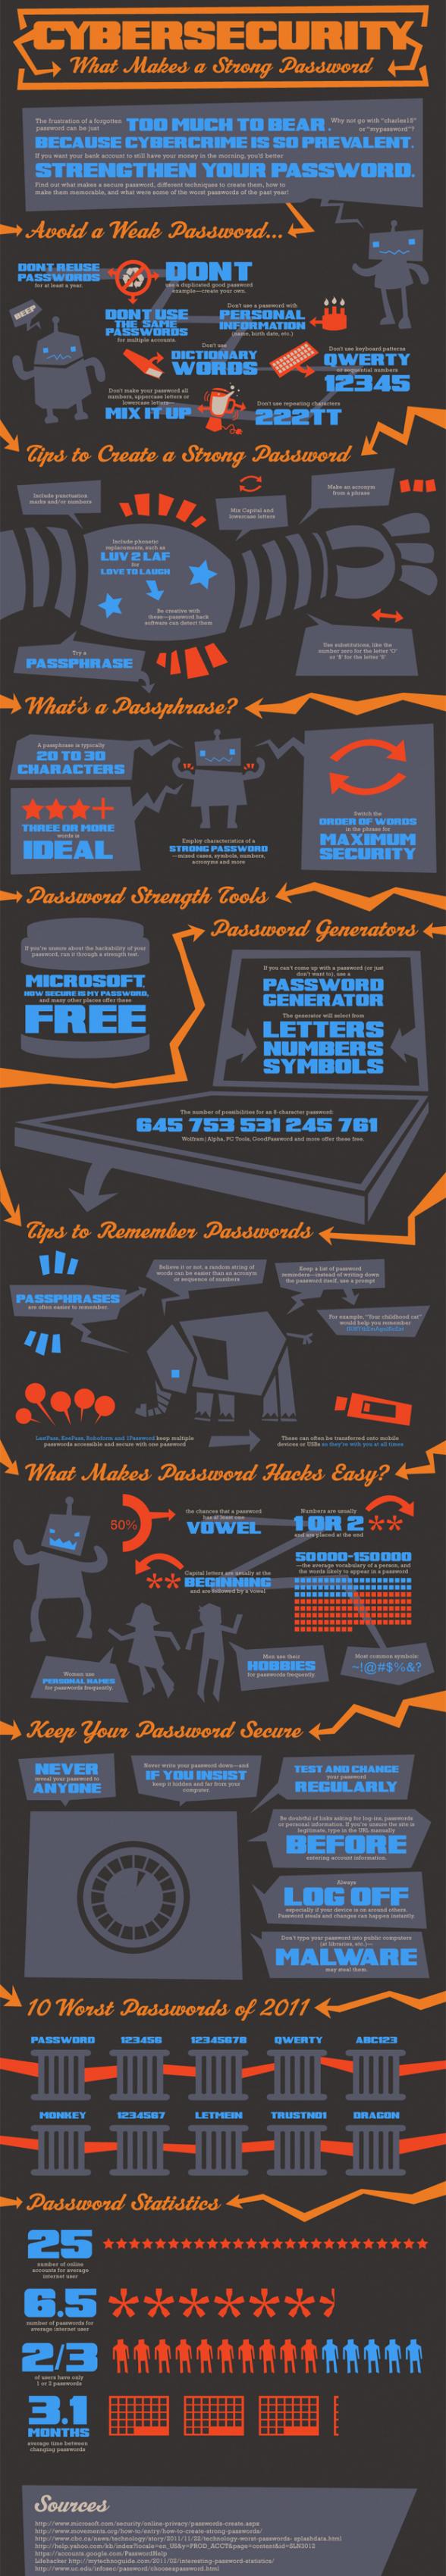 infographie-password